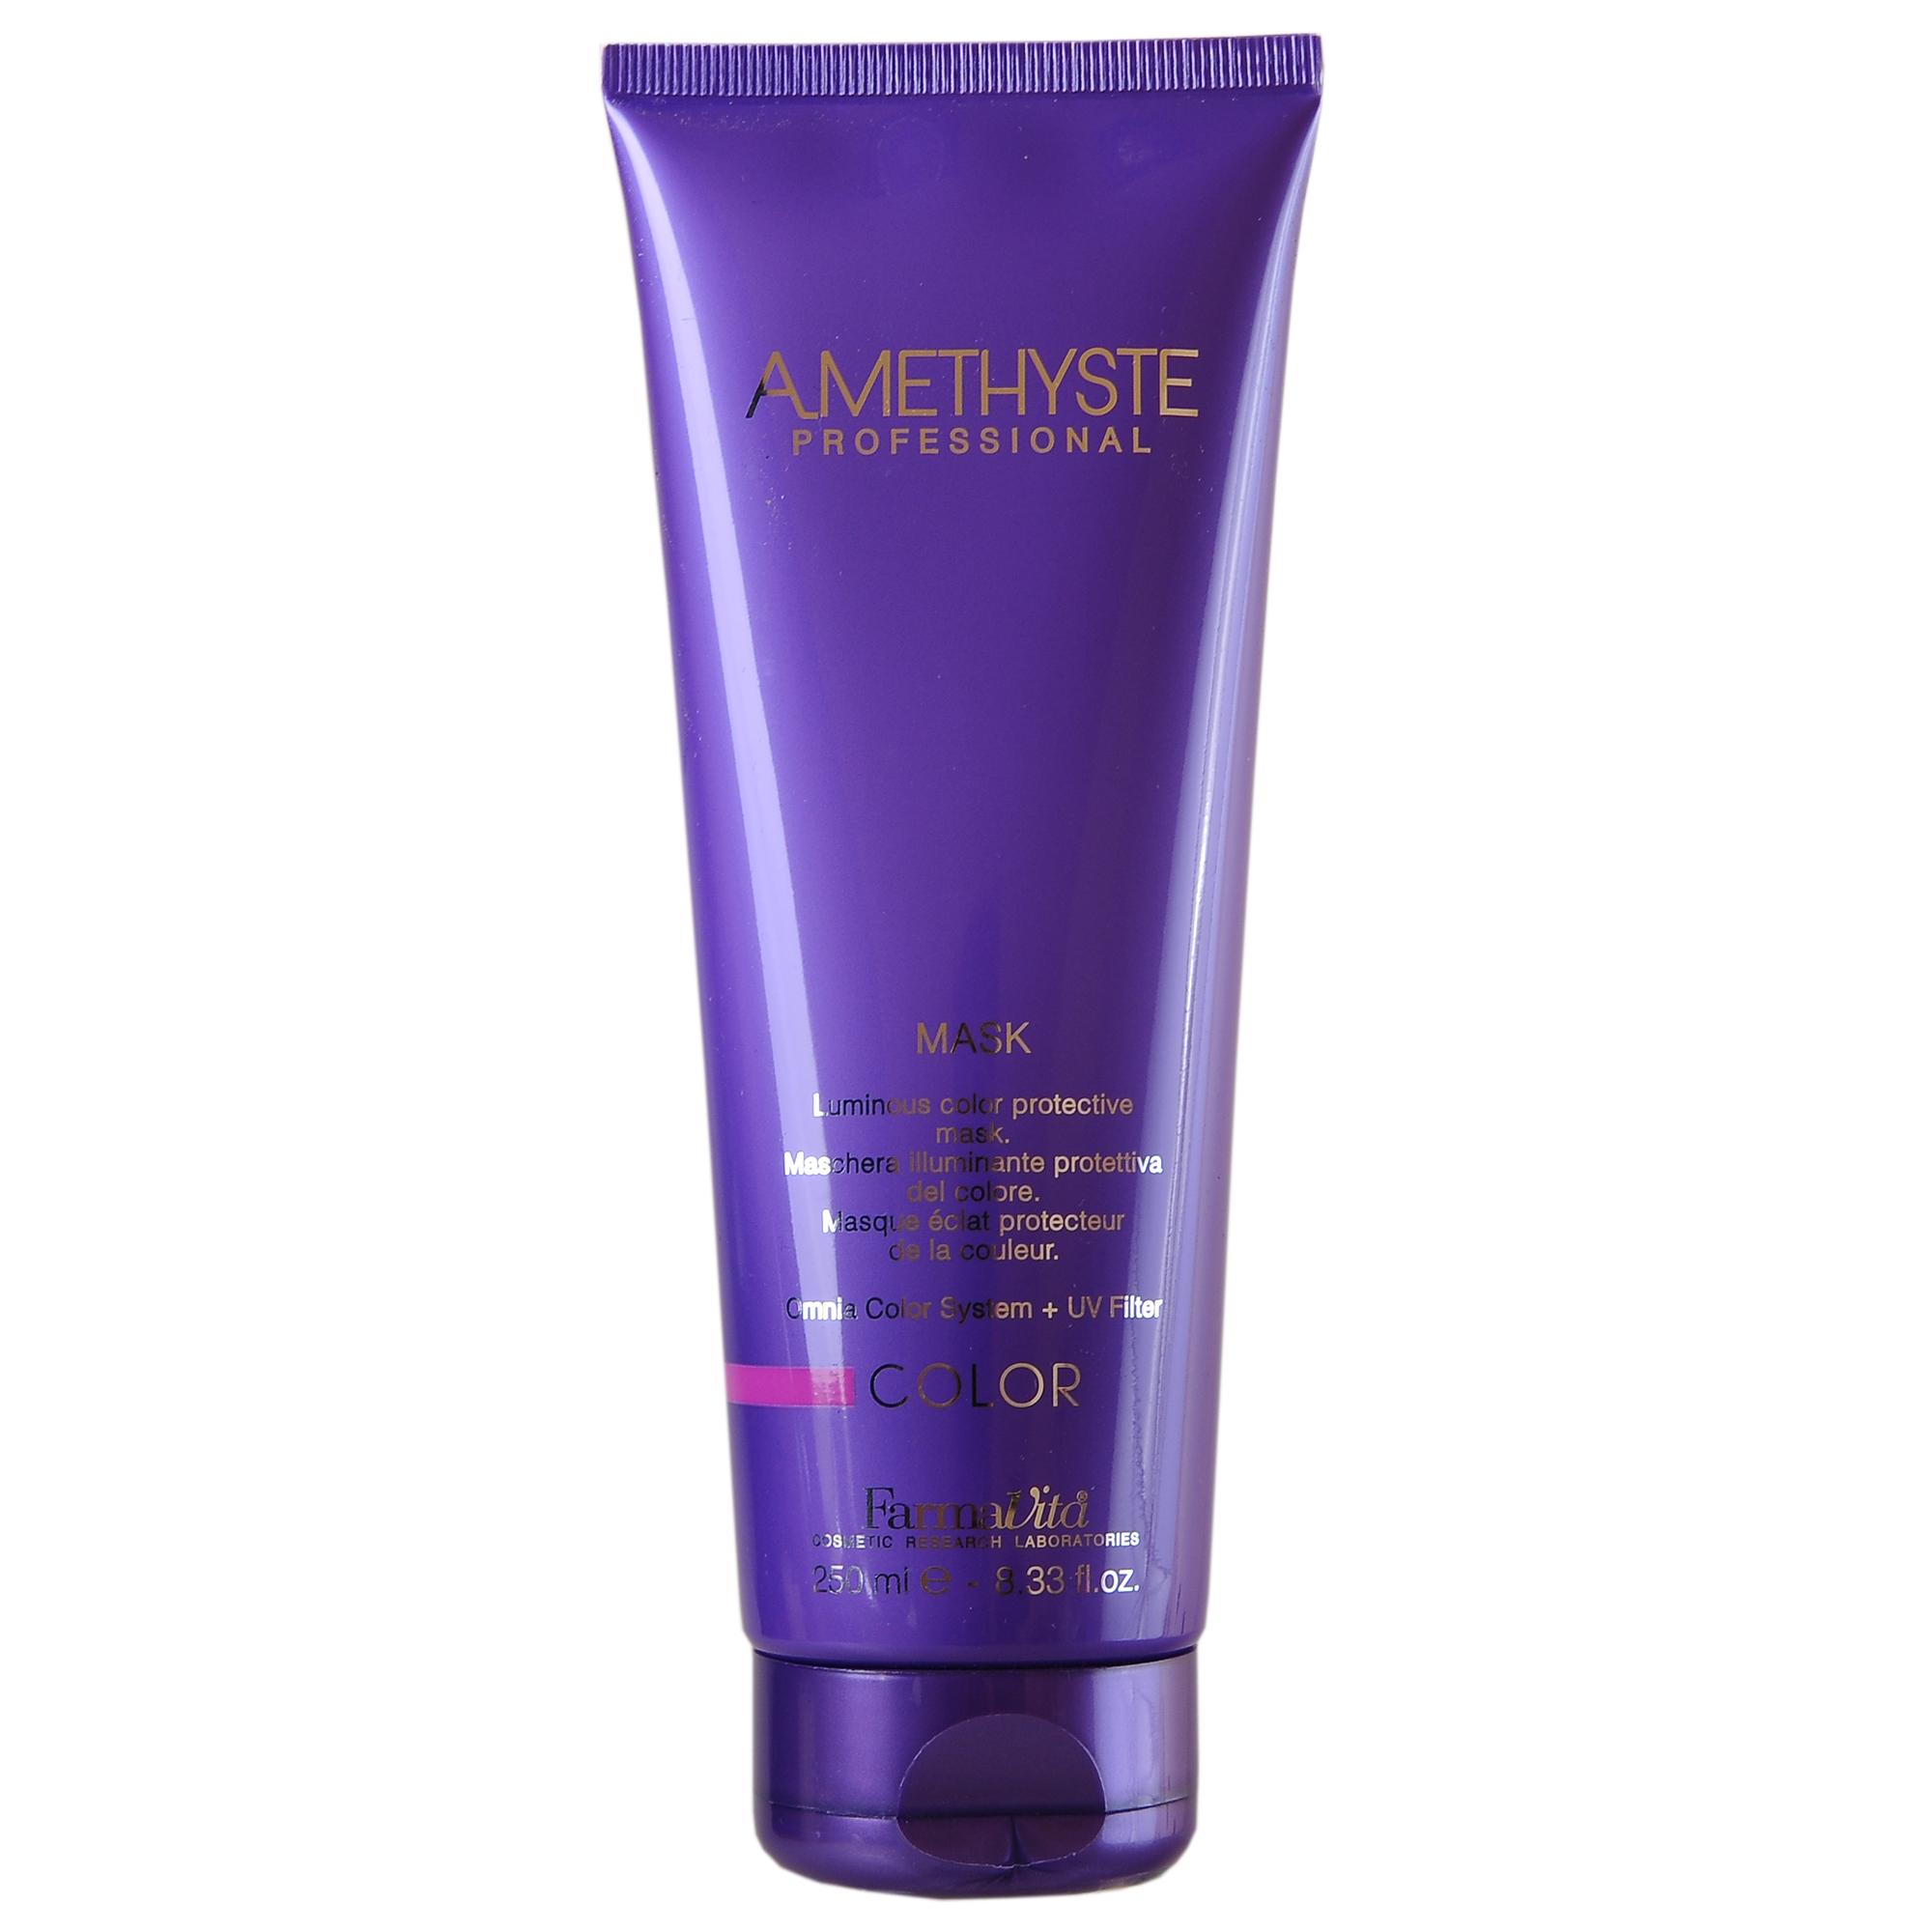 FARMAVITA Маска д/ухода за окрашенными волосами Amethyste color mask / AMETHYSTE PROFESSIONAL 250 мл